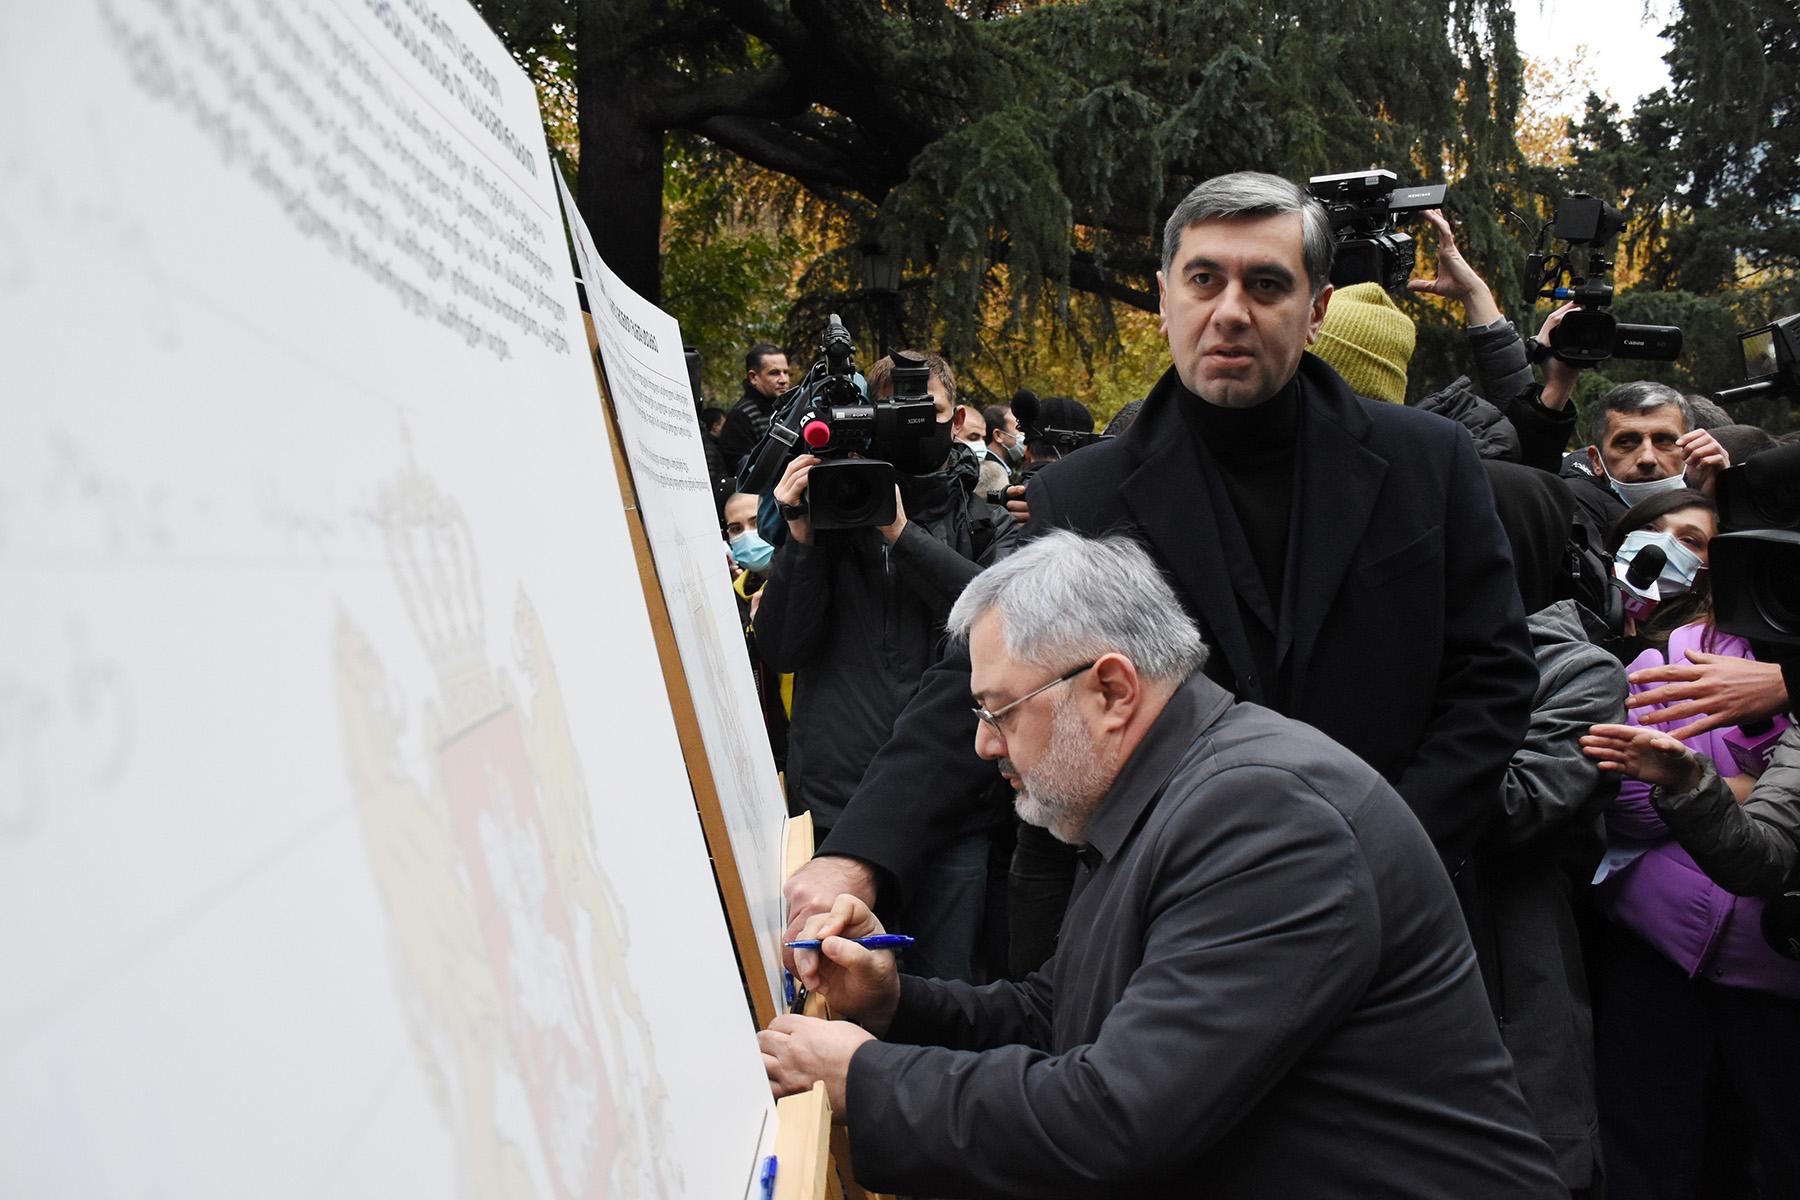 Davit Usupashvili and Irakli Okruashvili sign the memorandum. Photo: Mariam Nikuradze/OC Media.